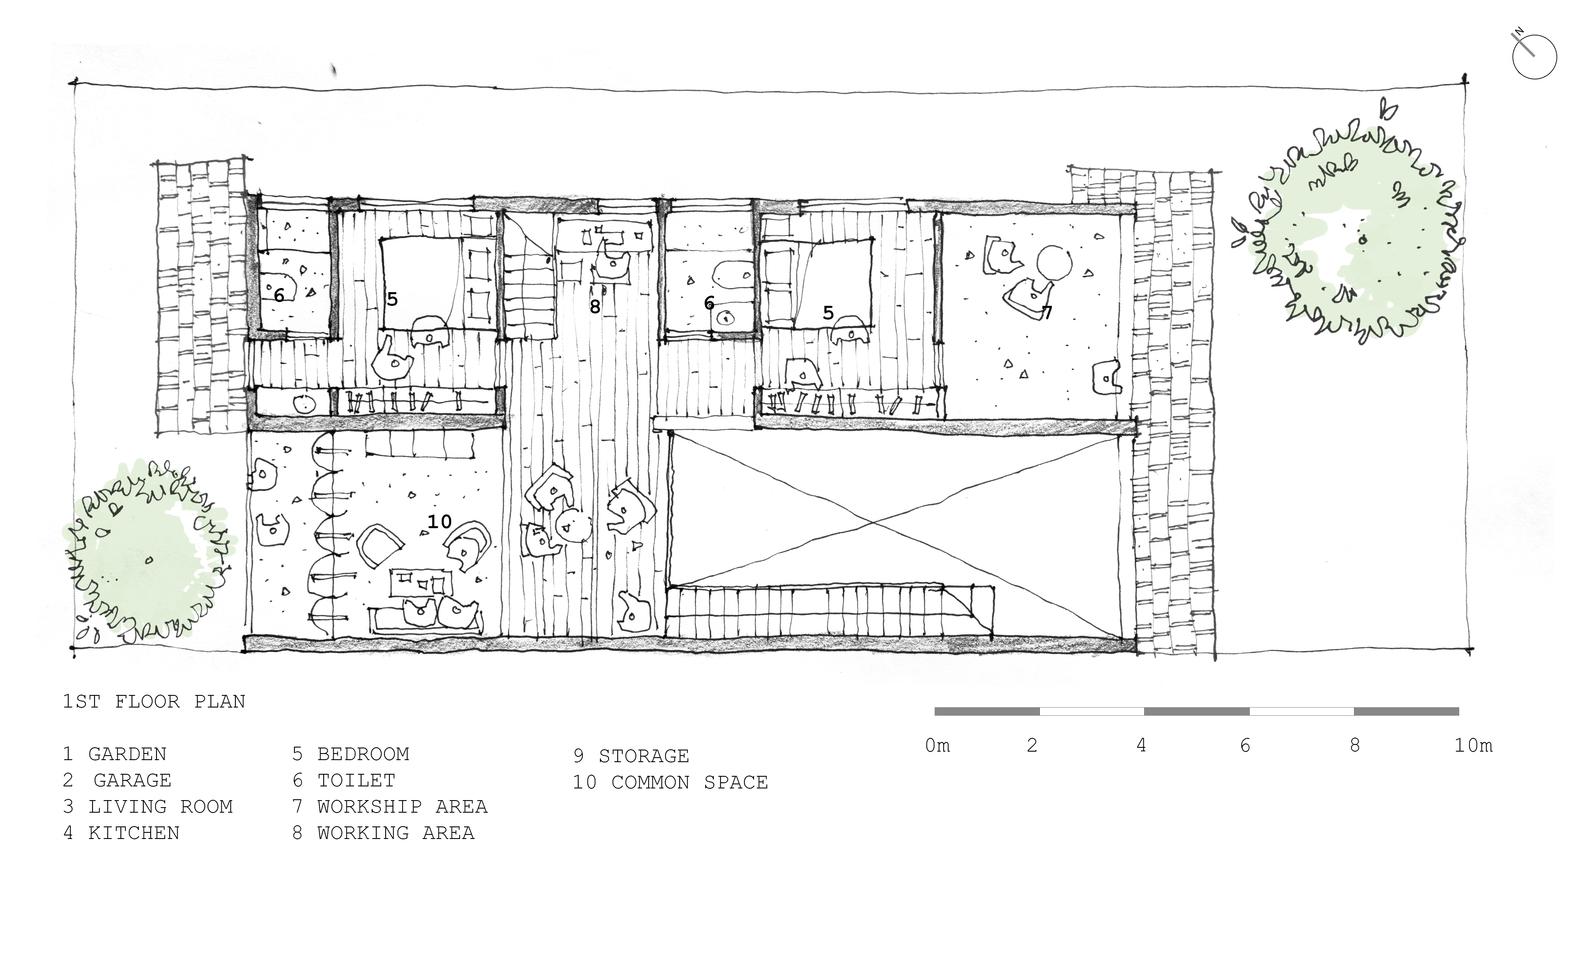 tile roof house k59atelier first floor plan [ 1582 x 964 Pixel ]